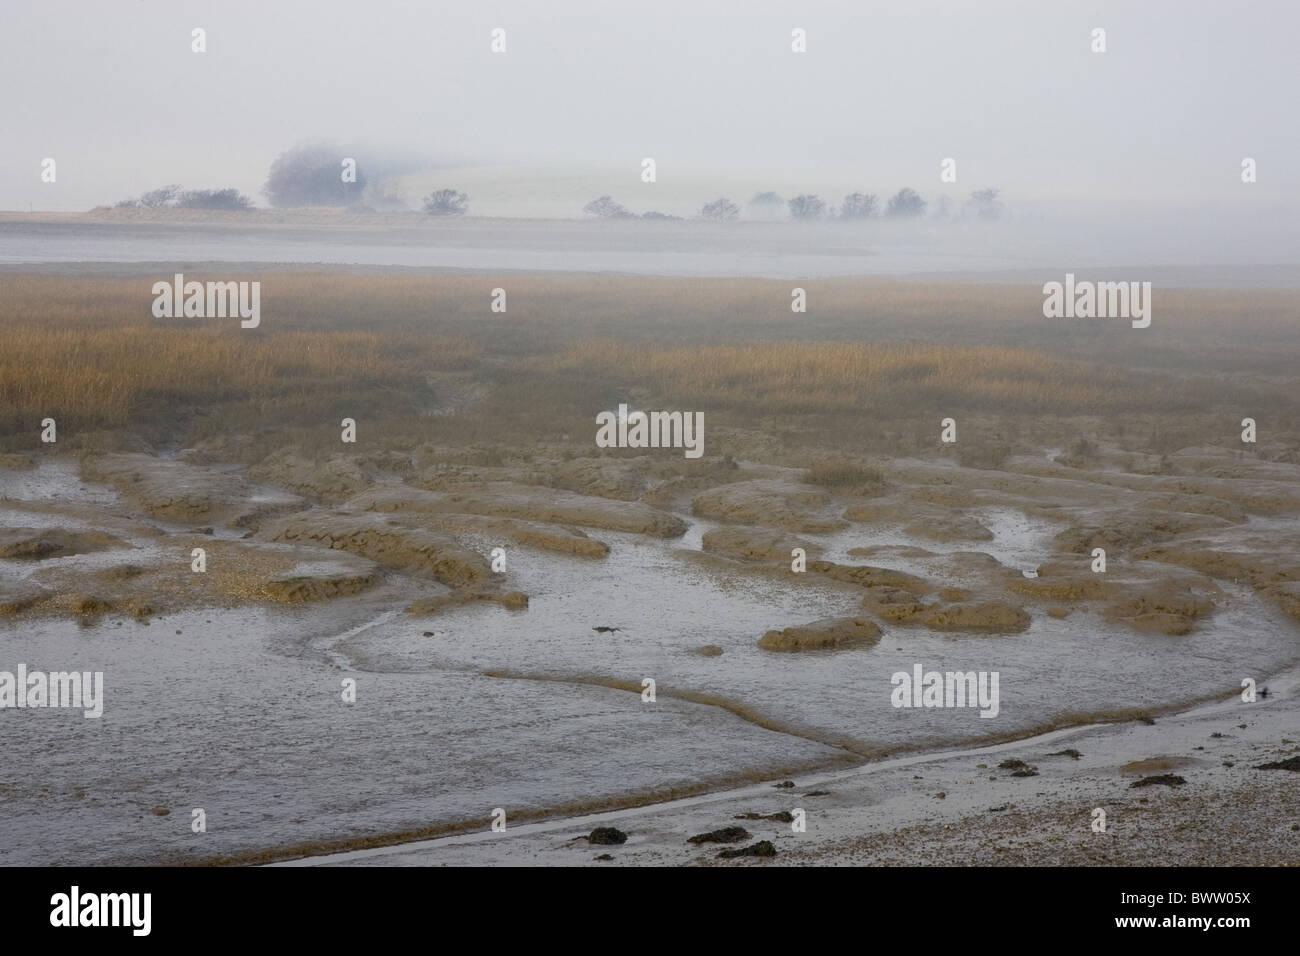 Early morning view of misty saltmarsh habitat, Levington Lagoon ...